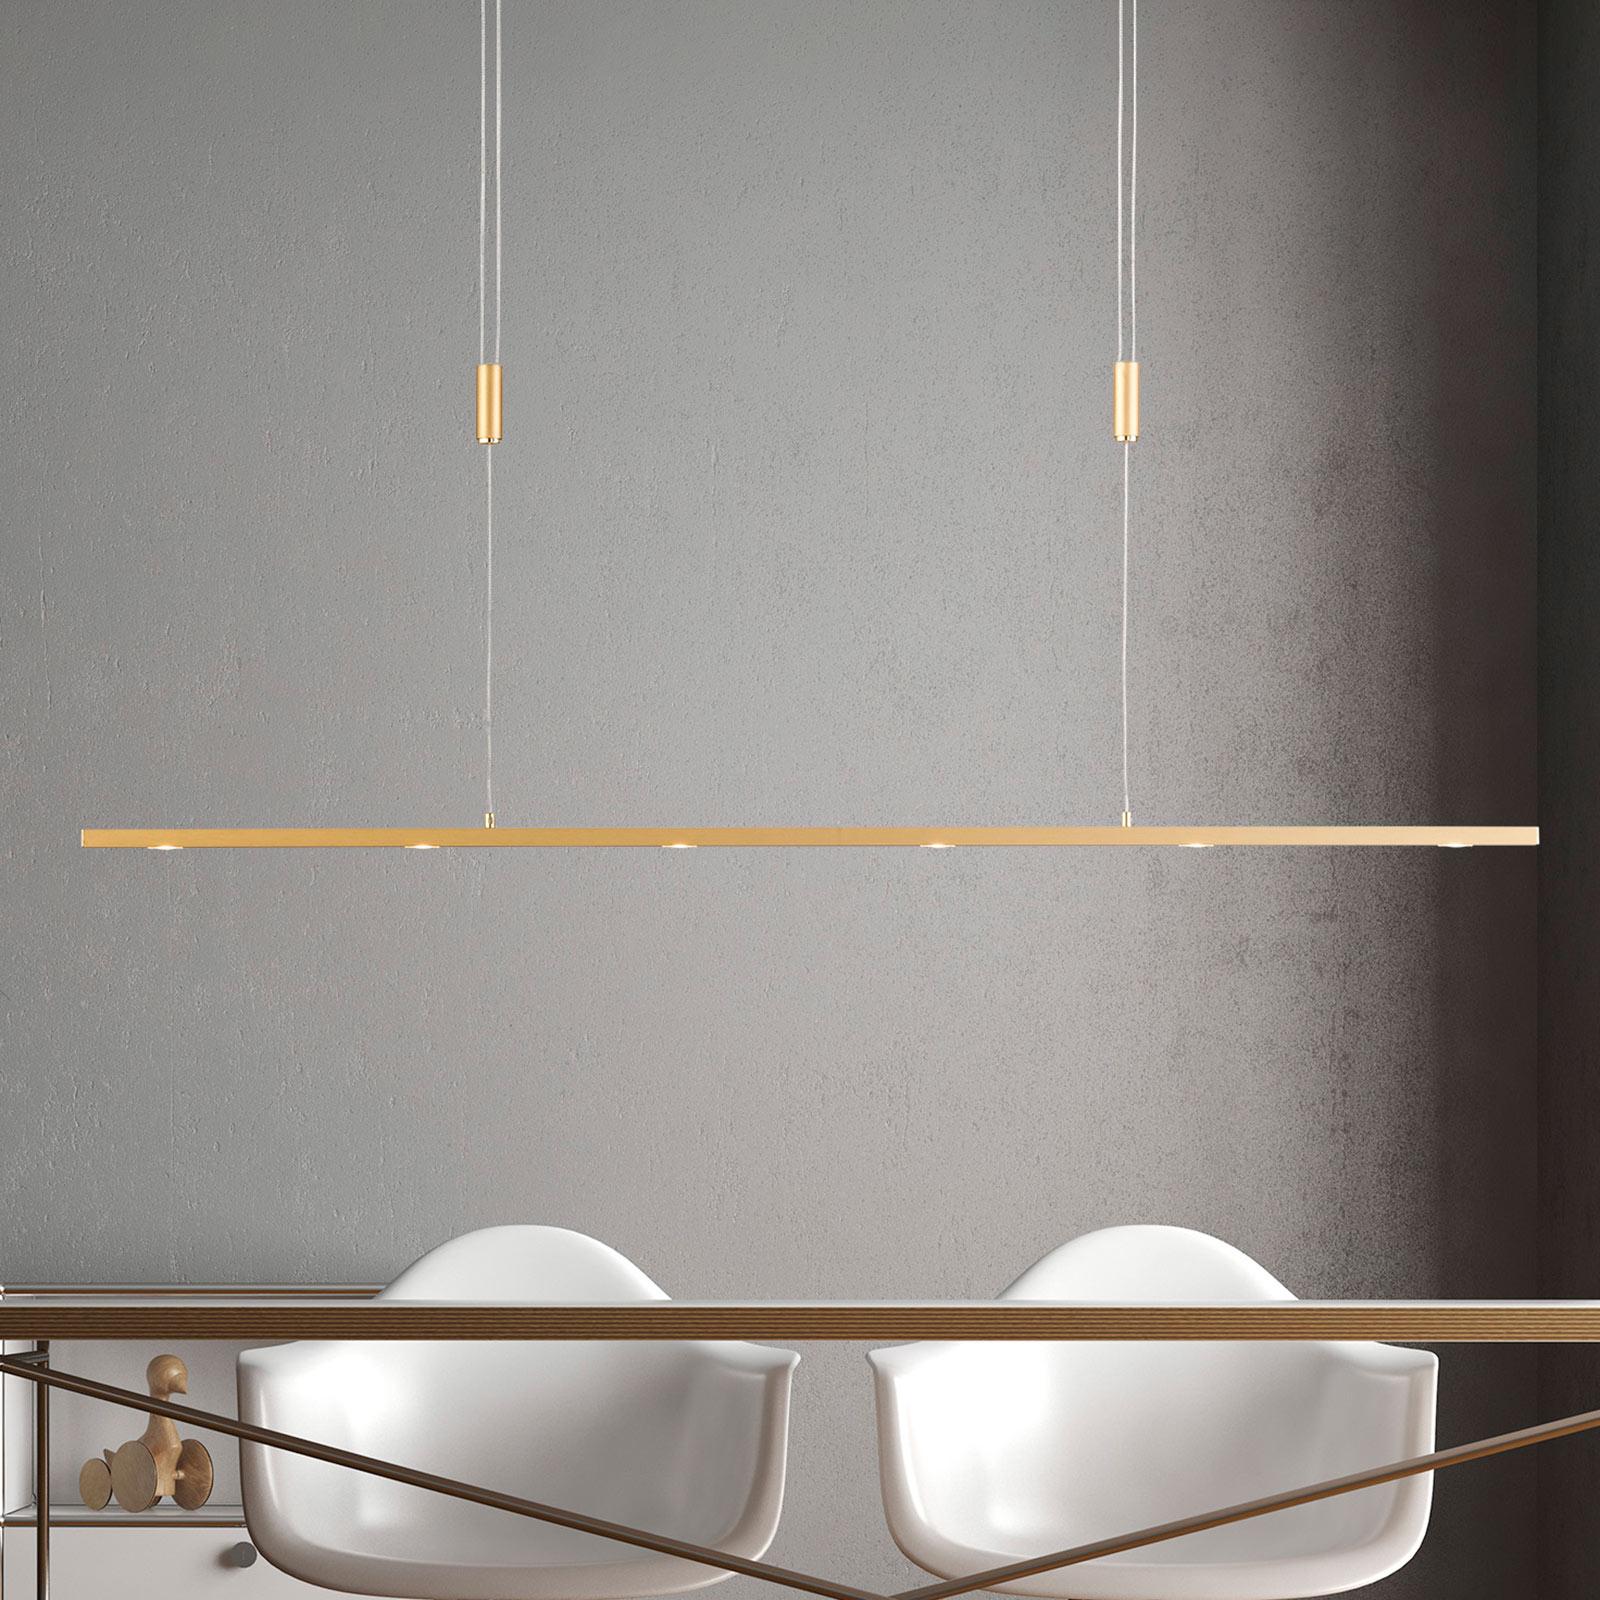 Lucande Tolu LED-riippuvalaisin, messinki, 119 cm